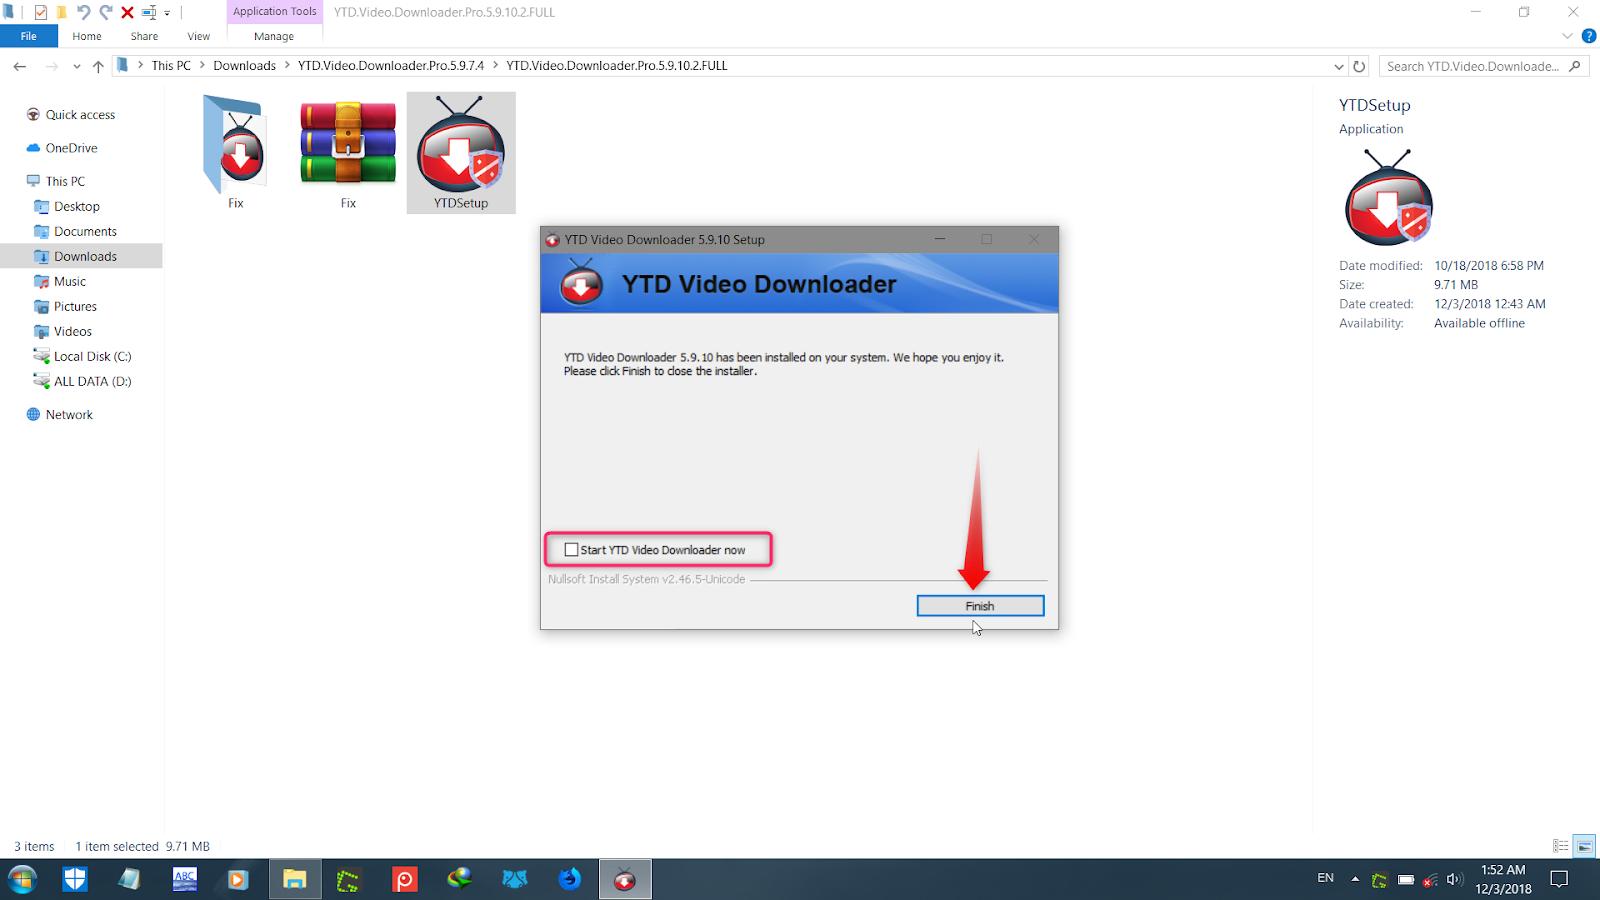 aloneghost-xz : YouTube Downloader (YTD) Pro 5 9 10 2 FULL